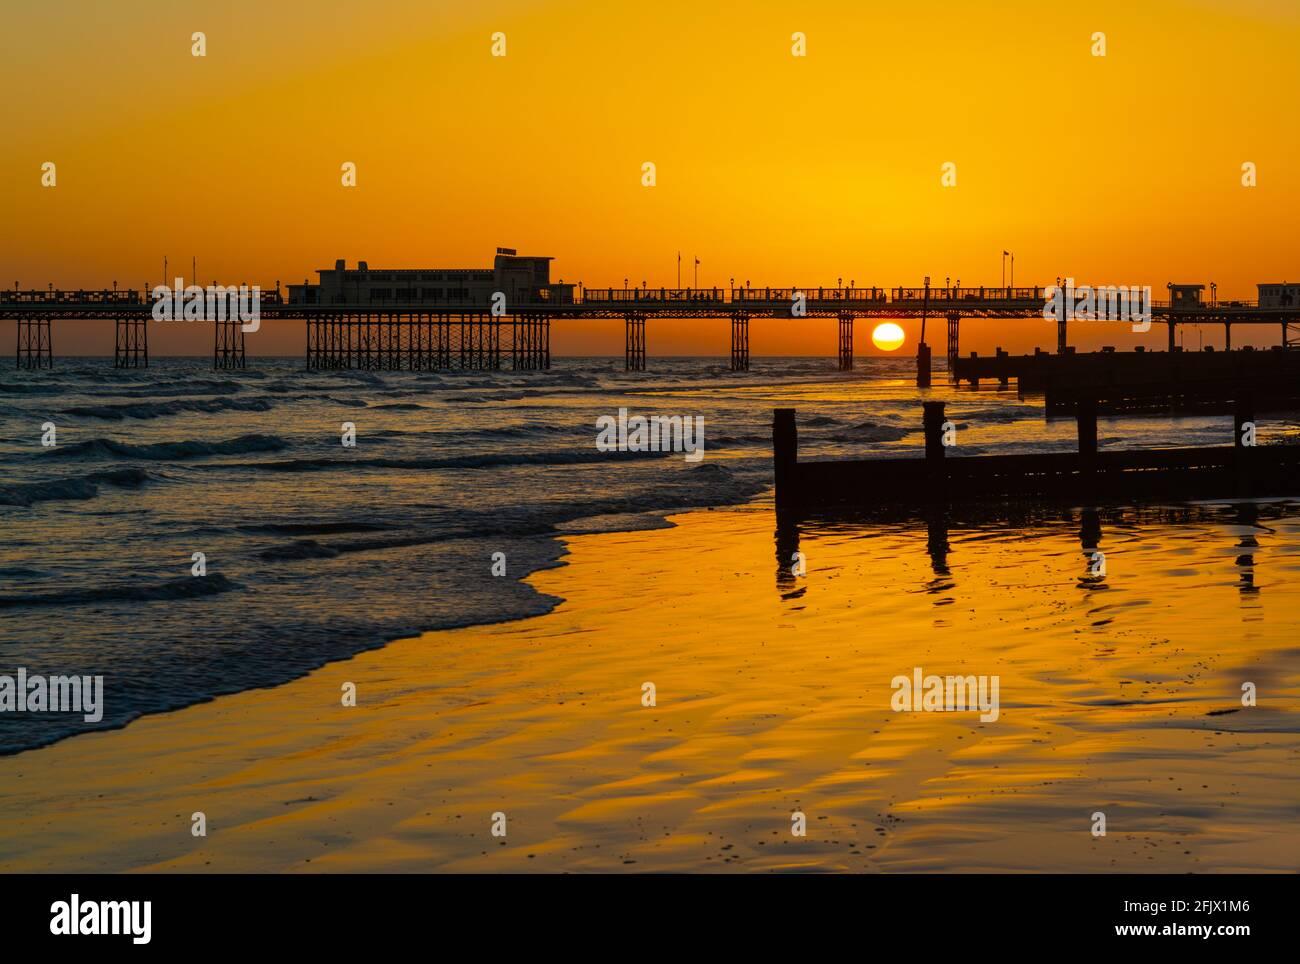 Sonnenuntergang über dem Meer am Worthing Pier in Worthing, West Sussex, England, UK. Stockfoto